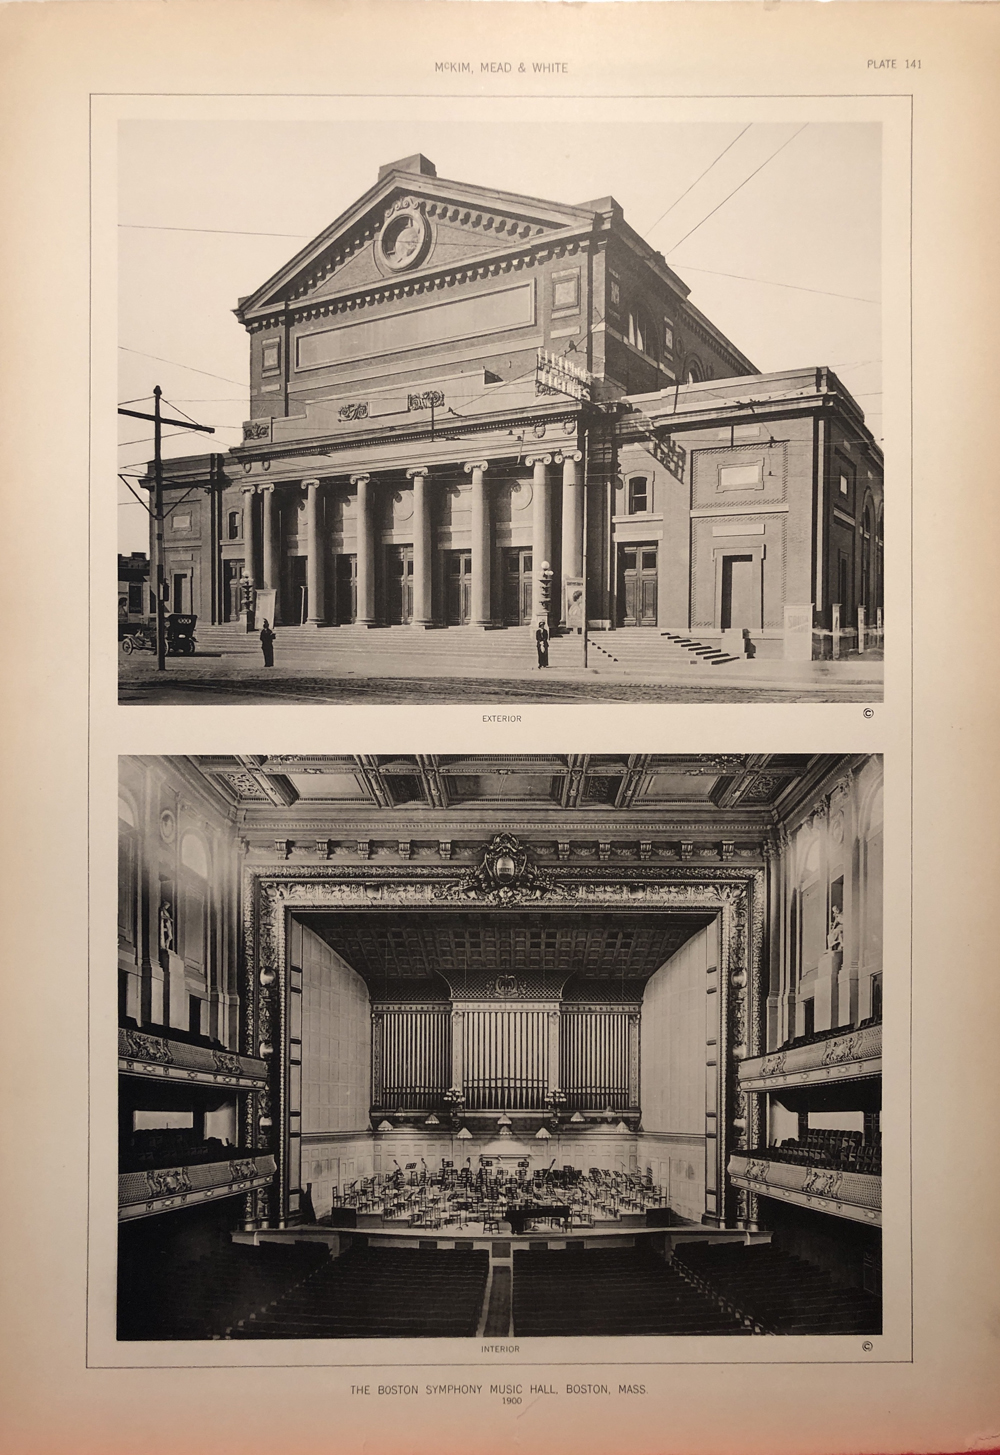 Symphony_Hall_plate_141